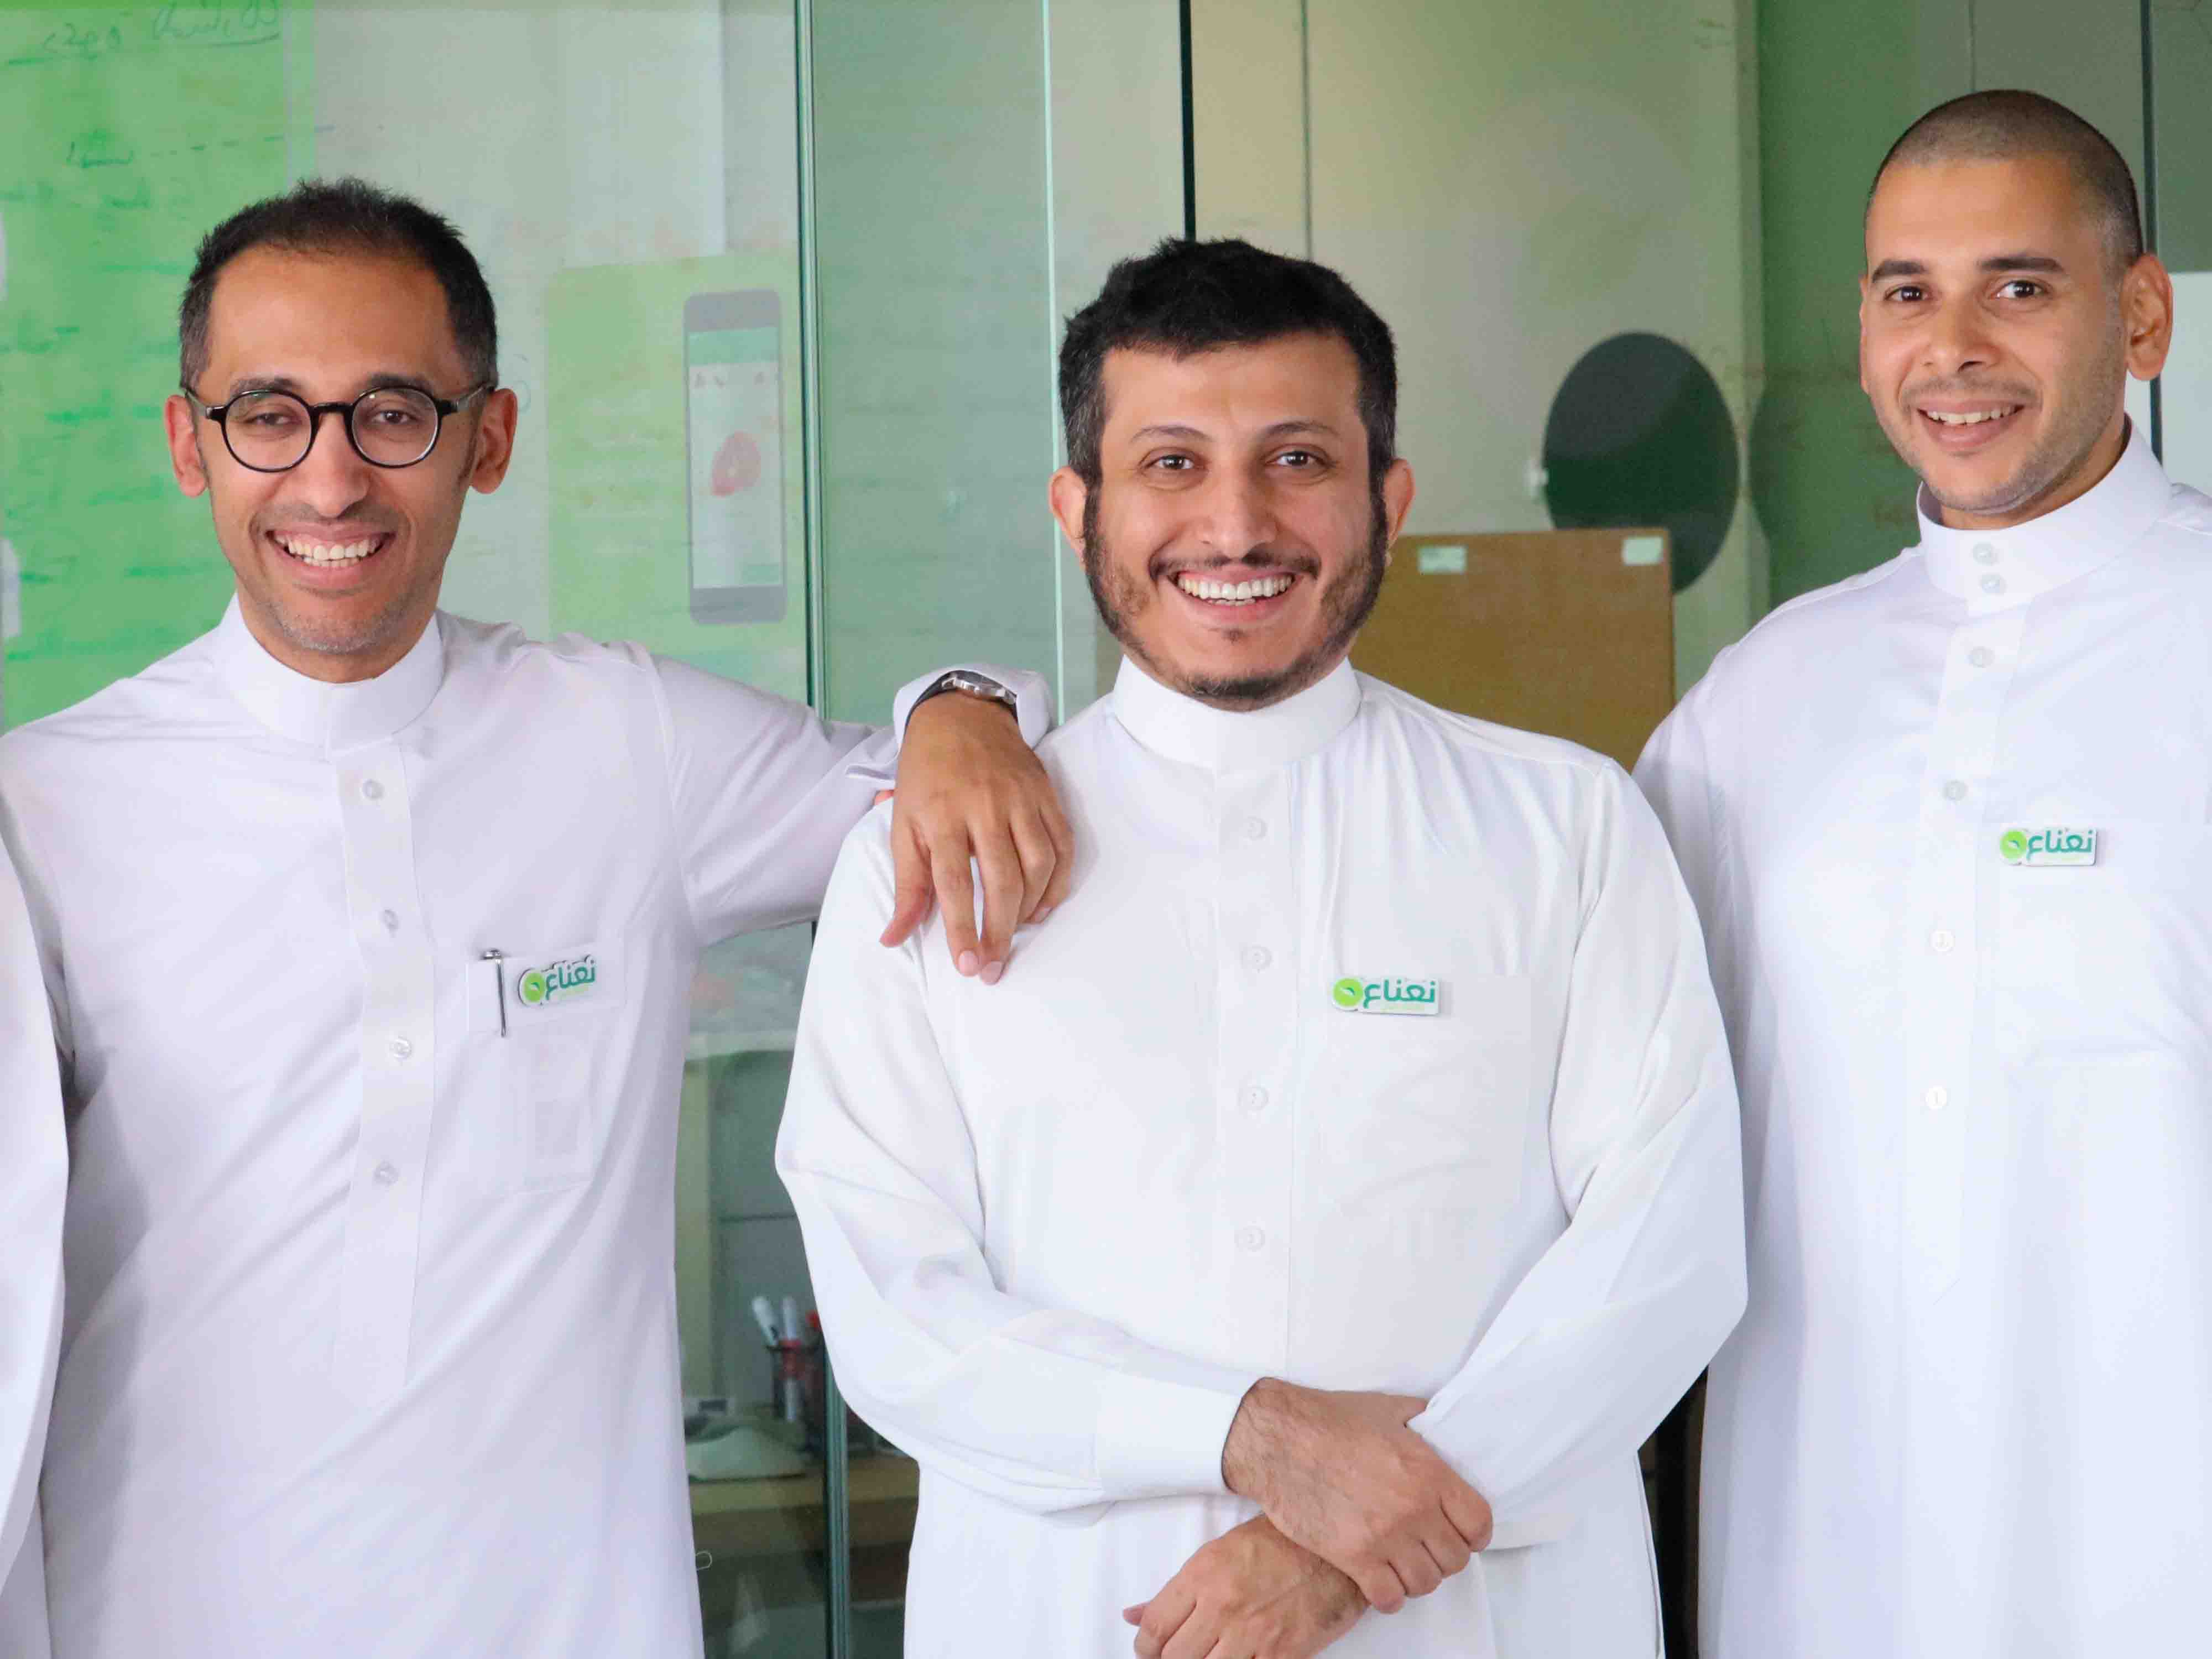 Saudi Arabia's Leading Online Grocery Platform Nana Raises $6.6M In Series A Financing Co-led By MEVP